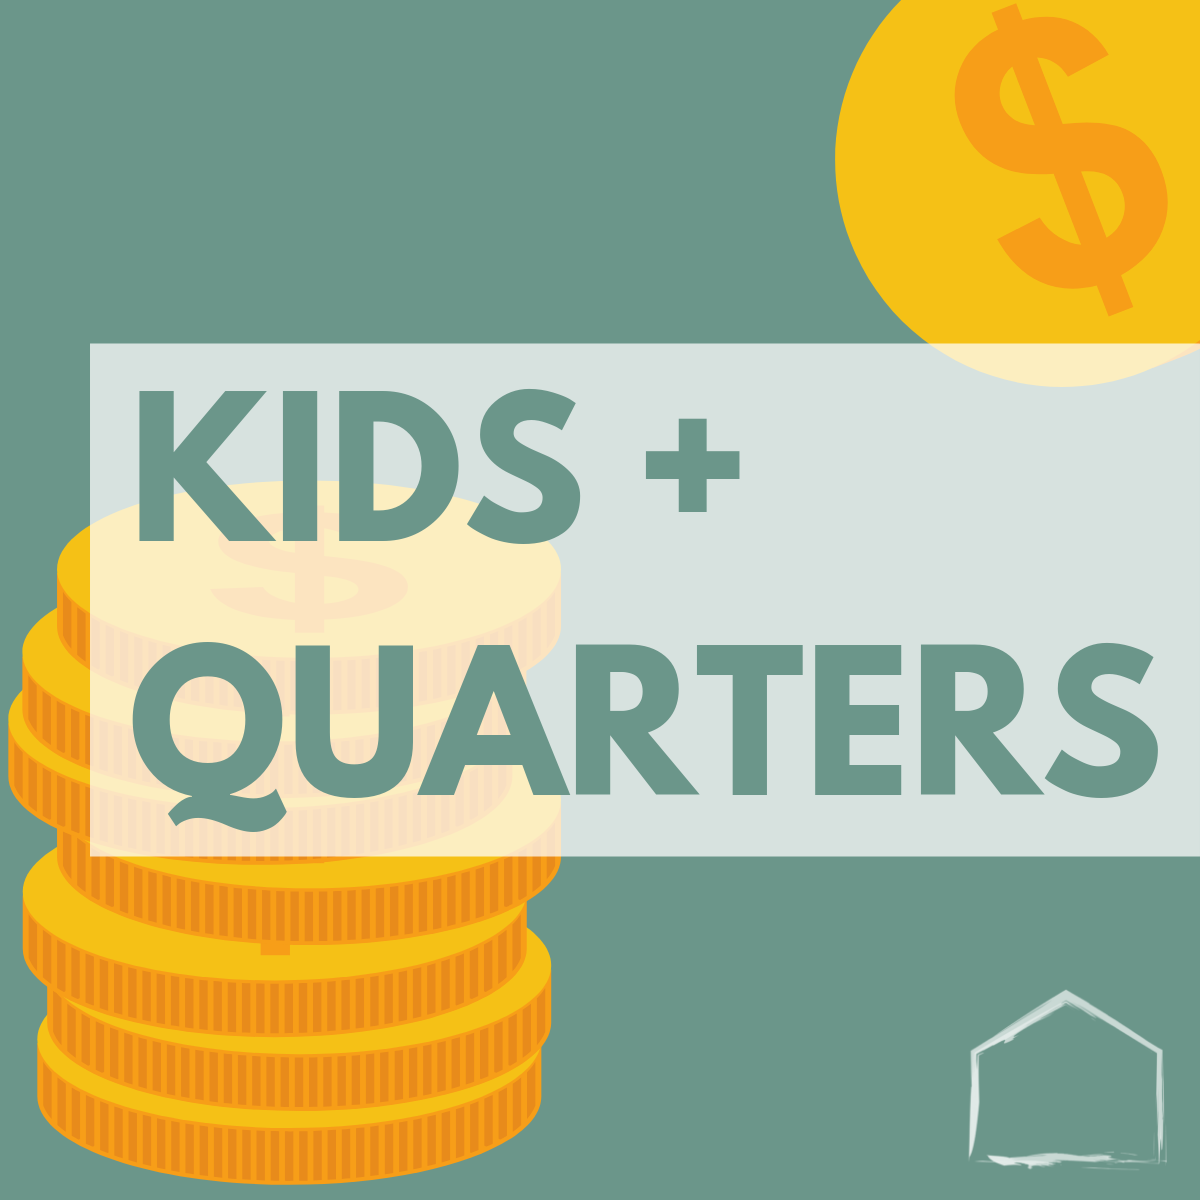 Copy of KIDS + QUARTERS.png